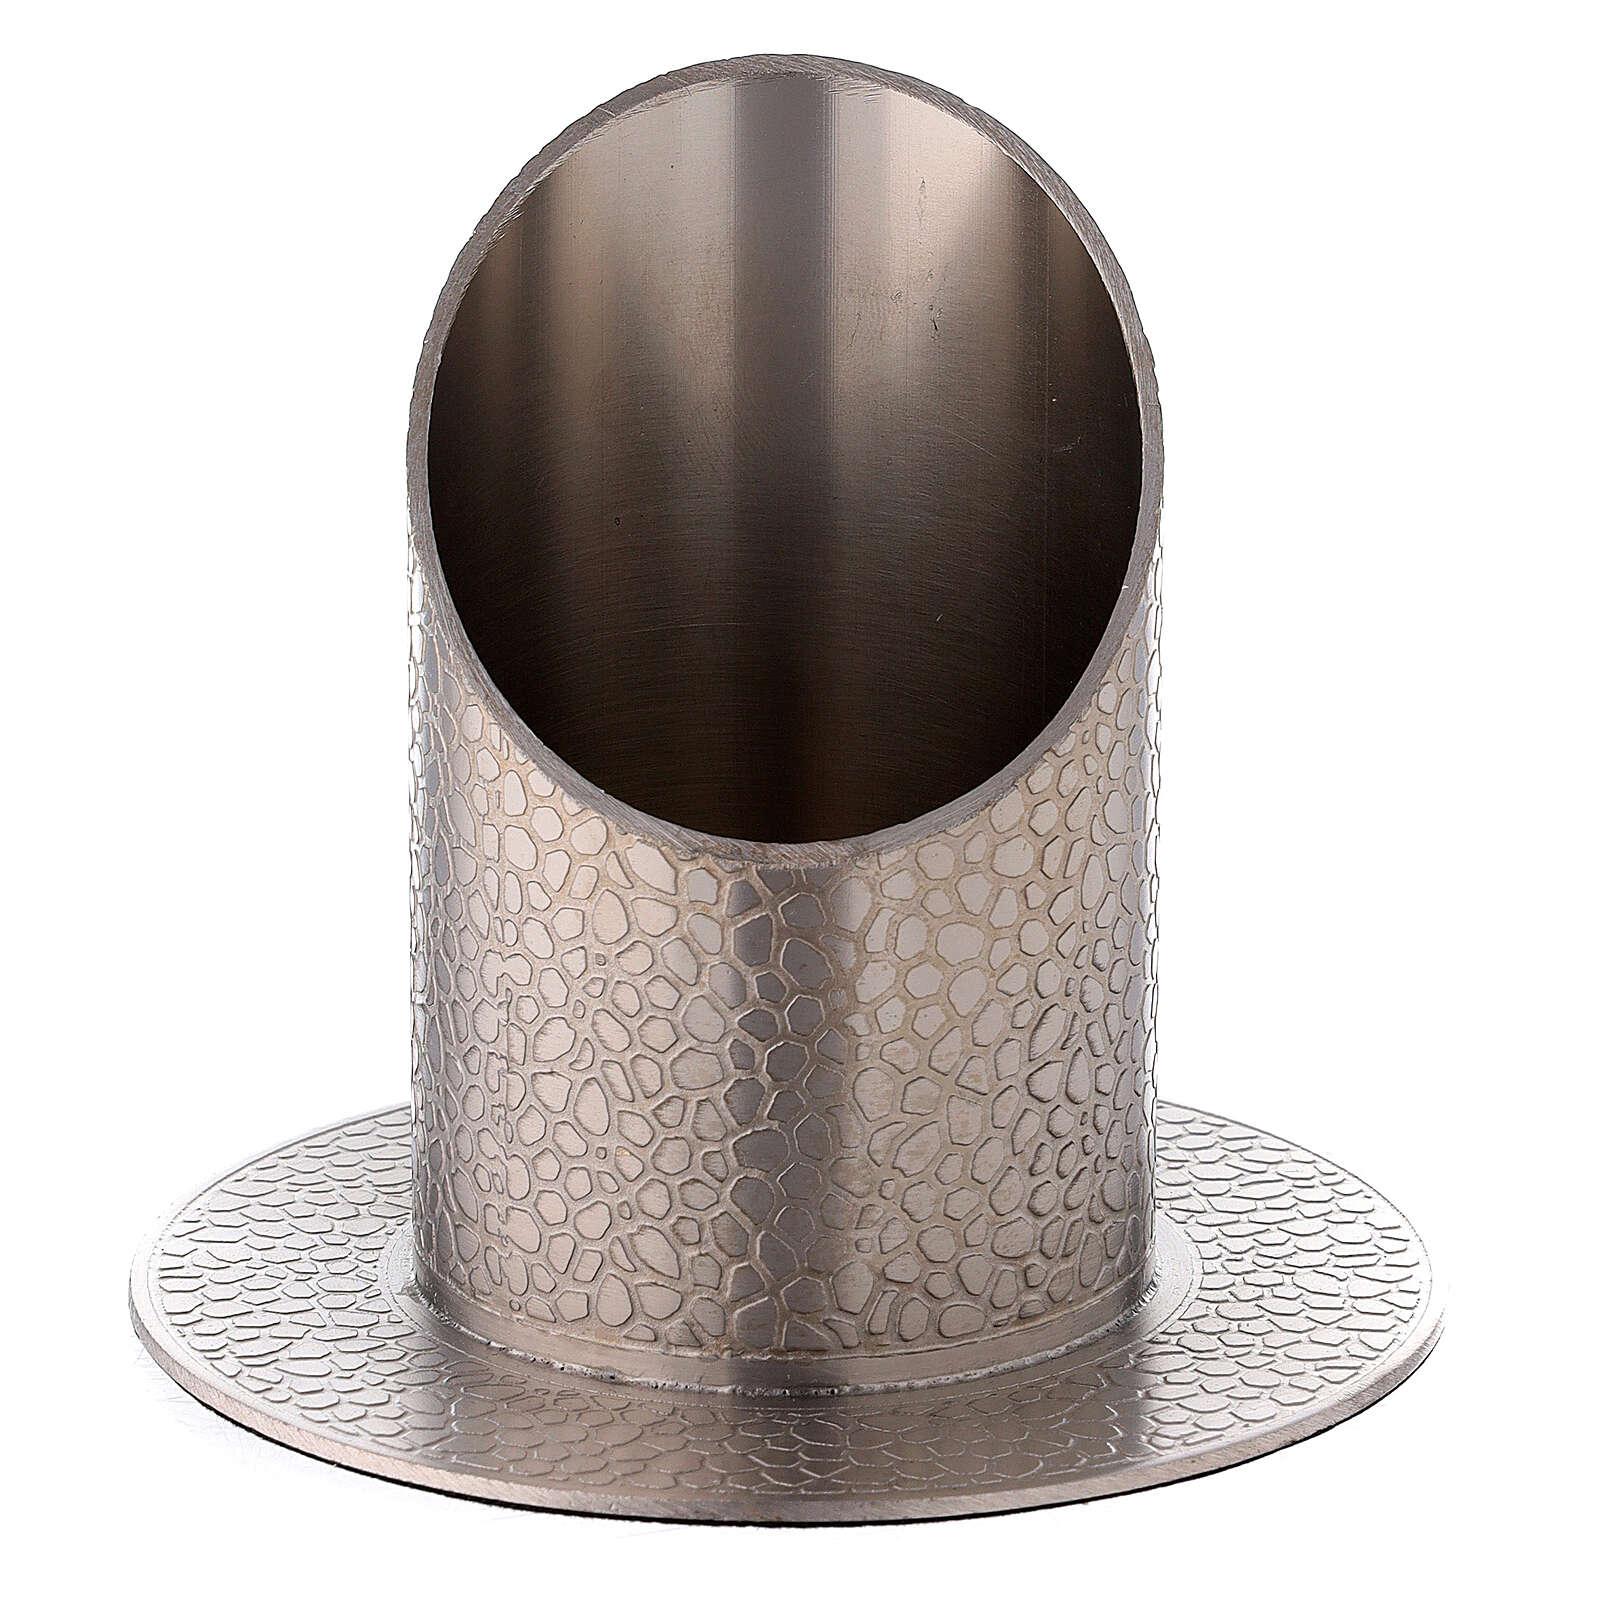 Bougoeir laiton nickelé effet cuir 5 cm 4